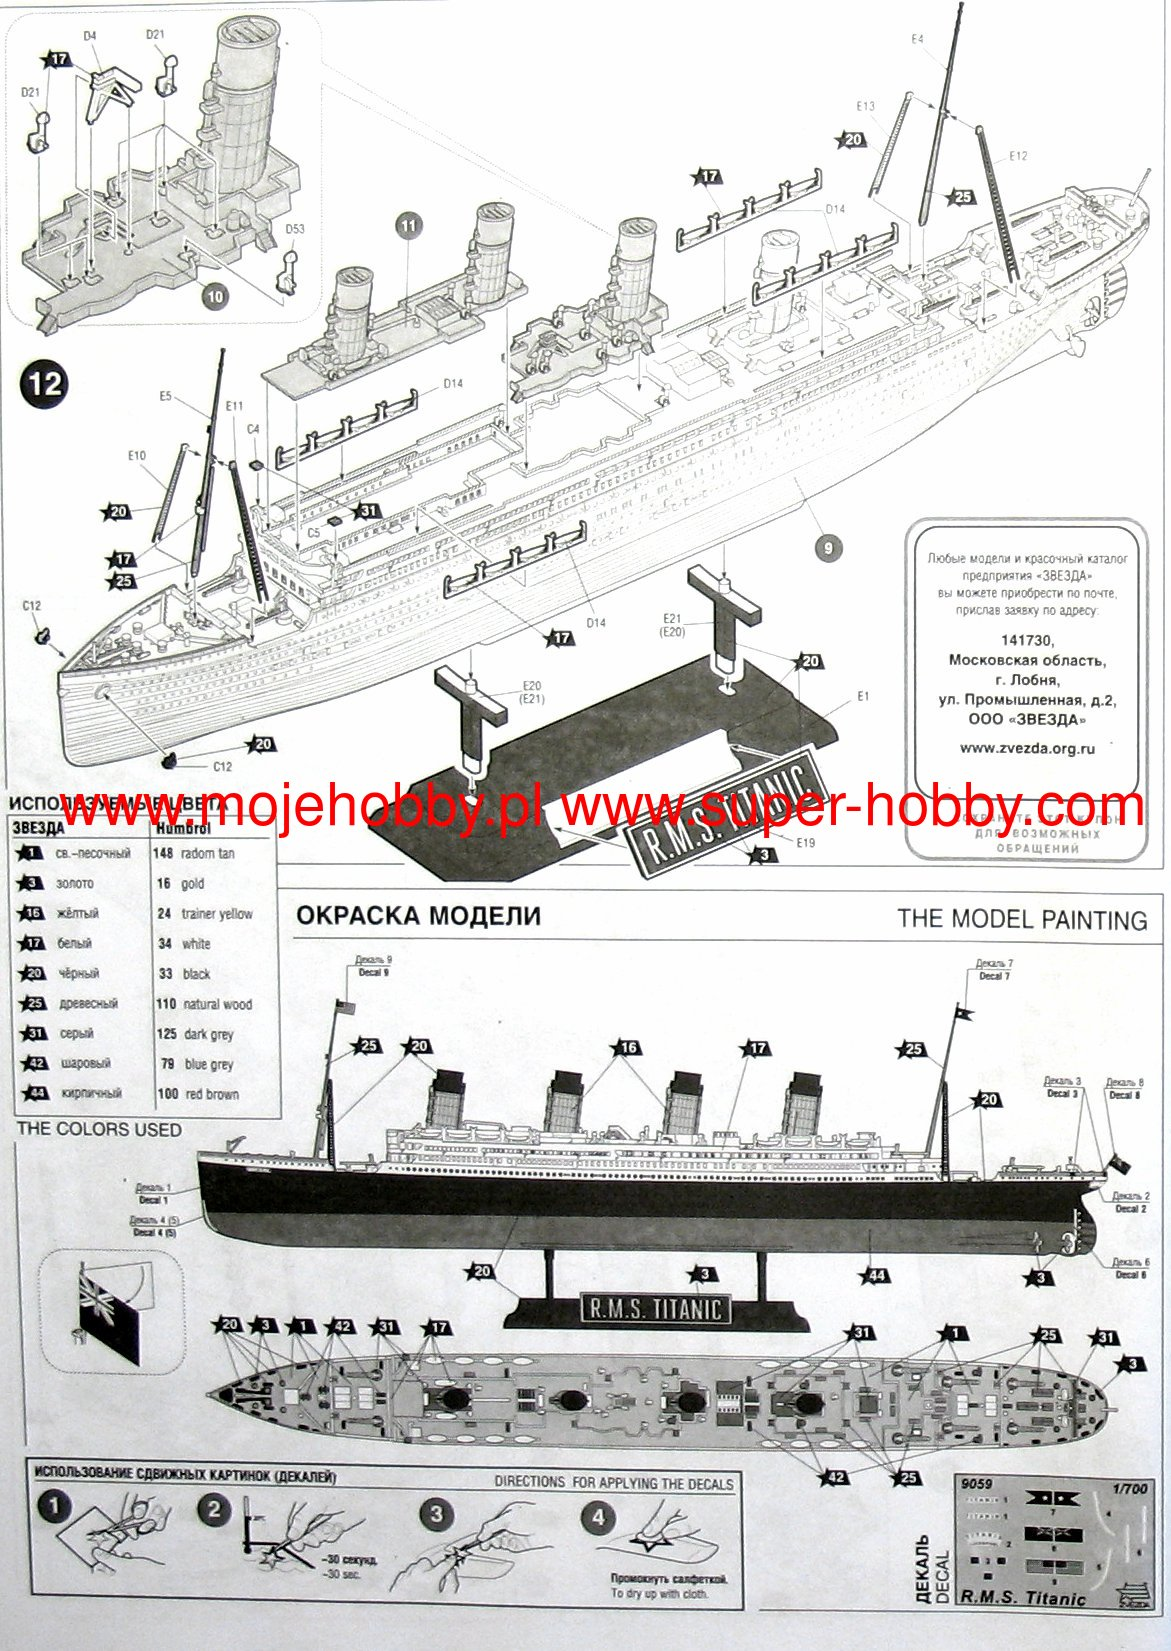 Map Of The Titanic : titanic, Titanic, Worksheet, Printable, Worksheets, Activities, Teachers,, Parents,, Tutors, Homeschool, Families